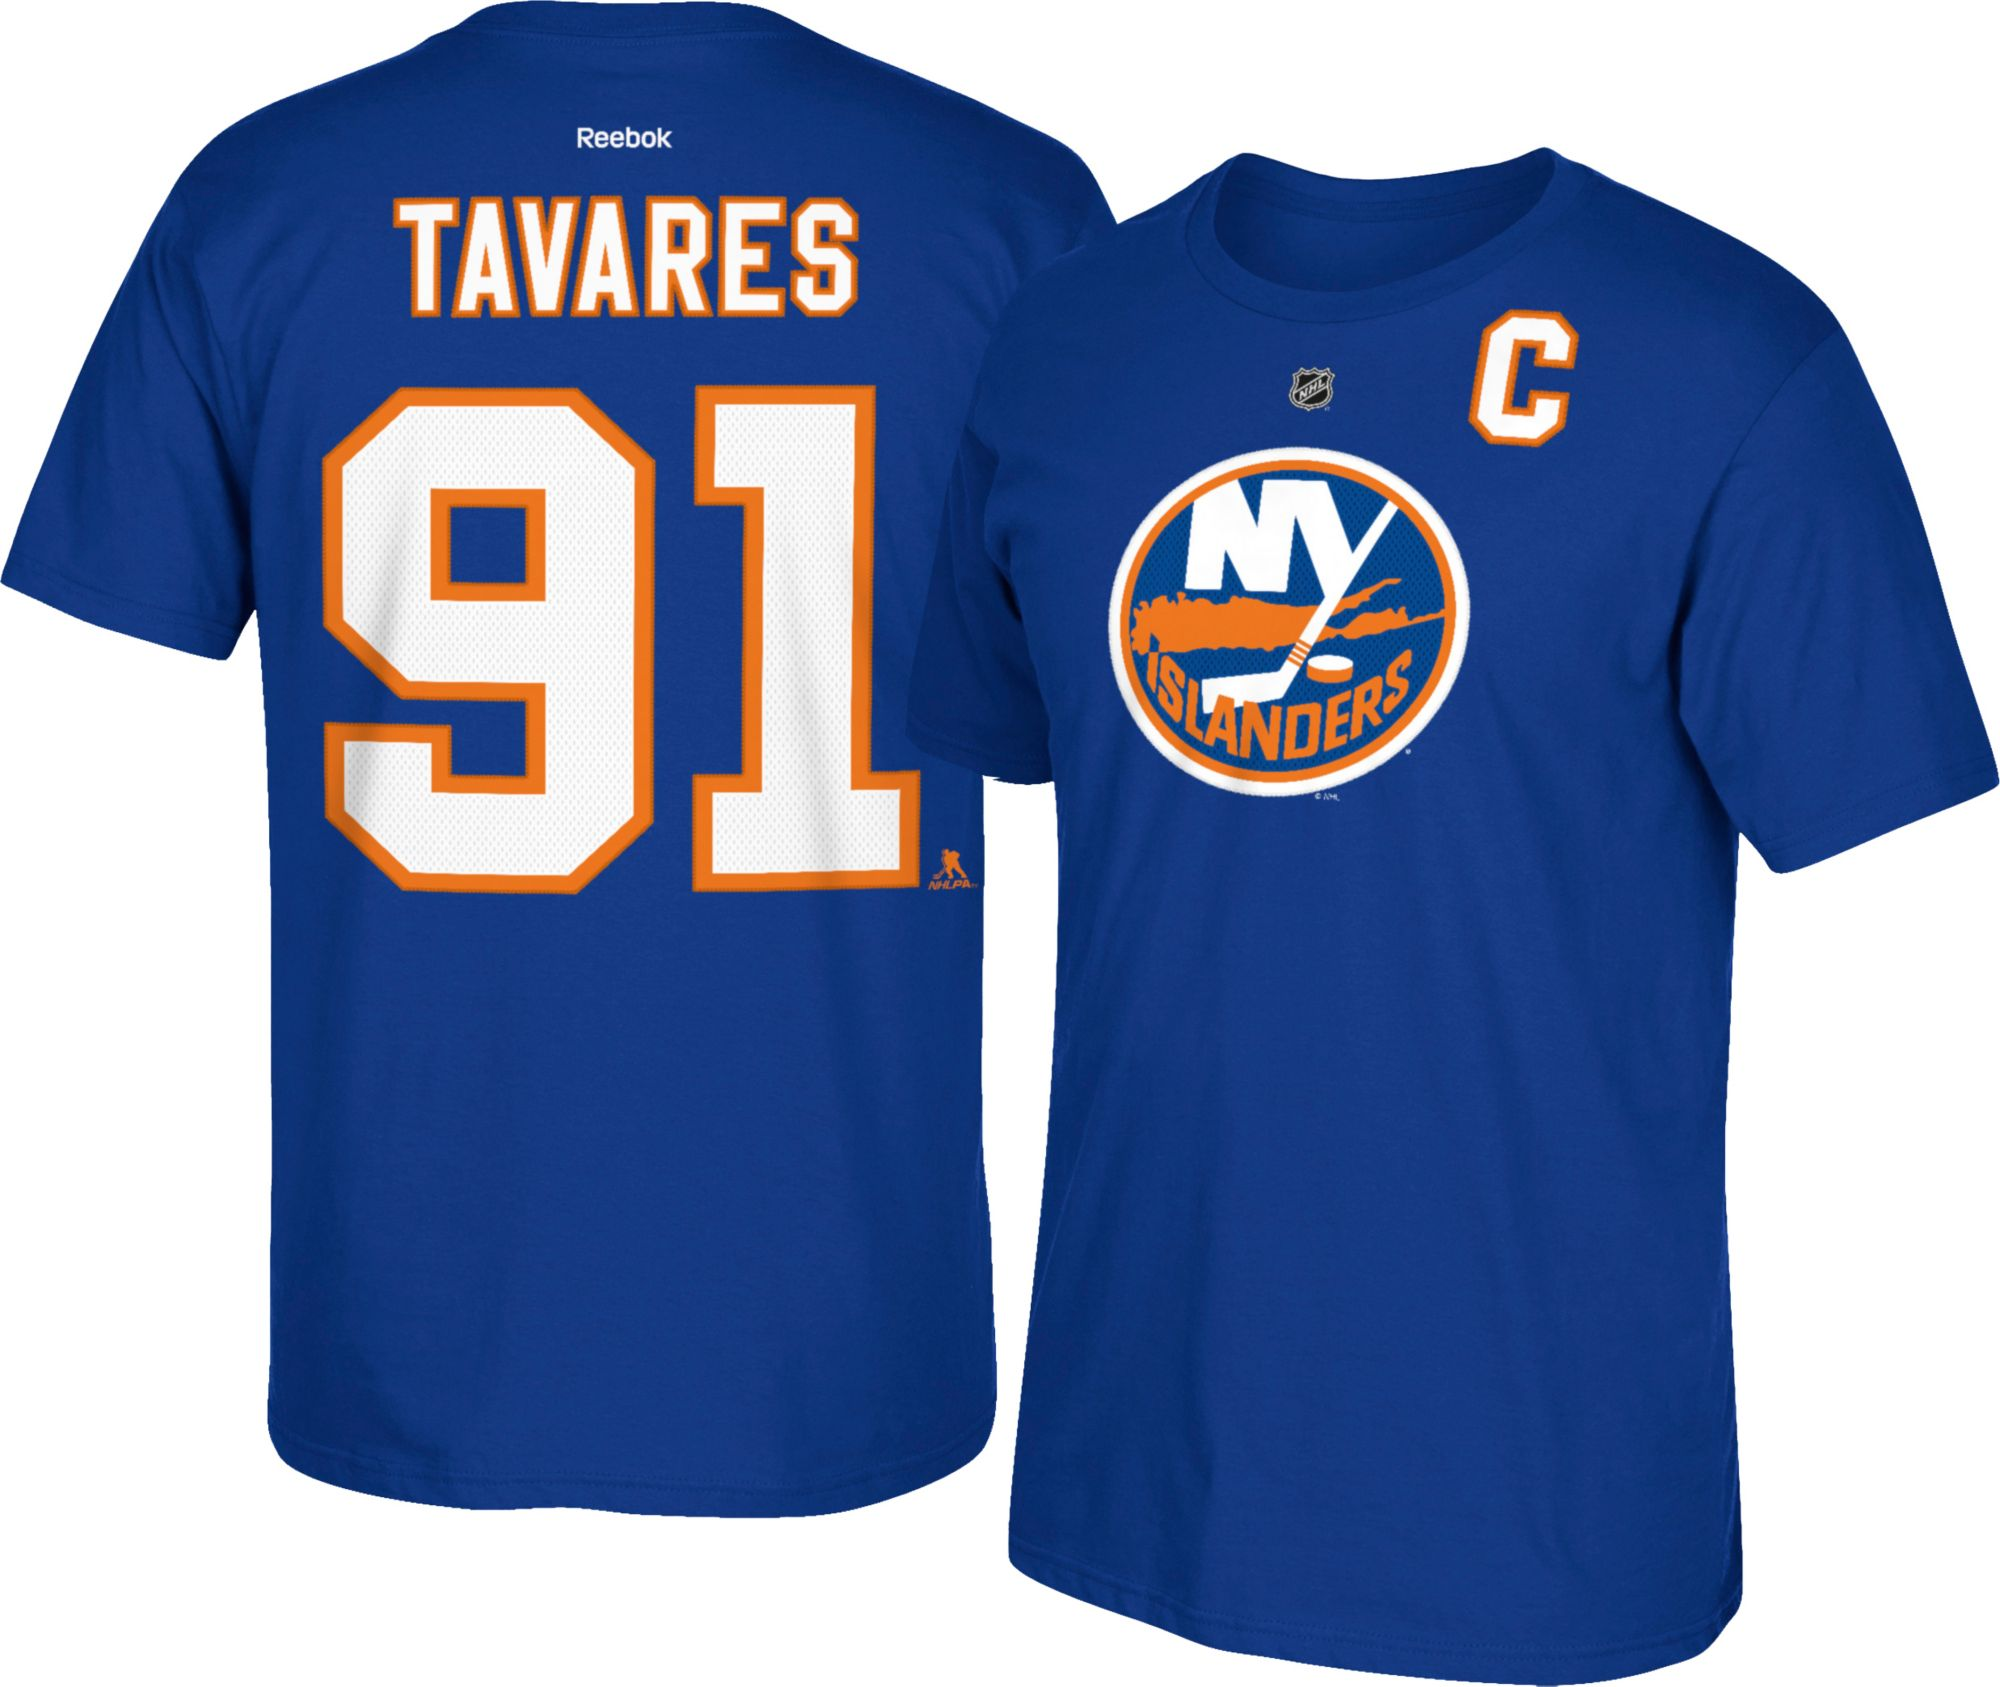 fd1718d3 ... Official Third Reebok Premier Replica NHL Reebok Mens New York  Islanders John Tavares 91 T-Shirt DICK ...